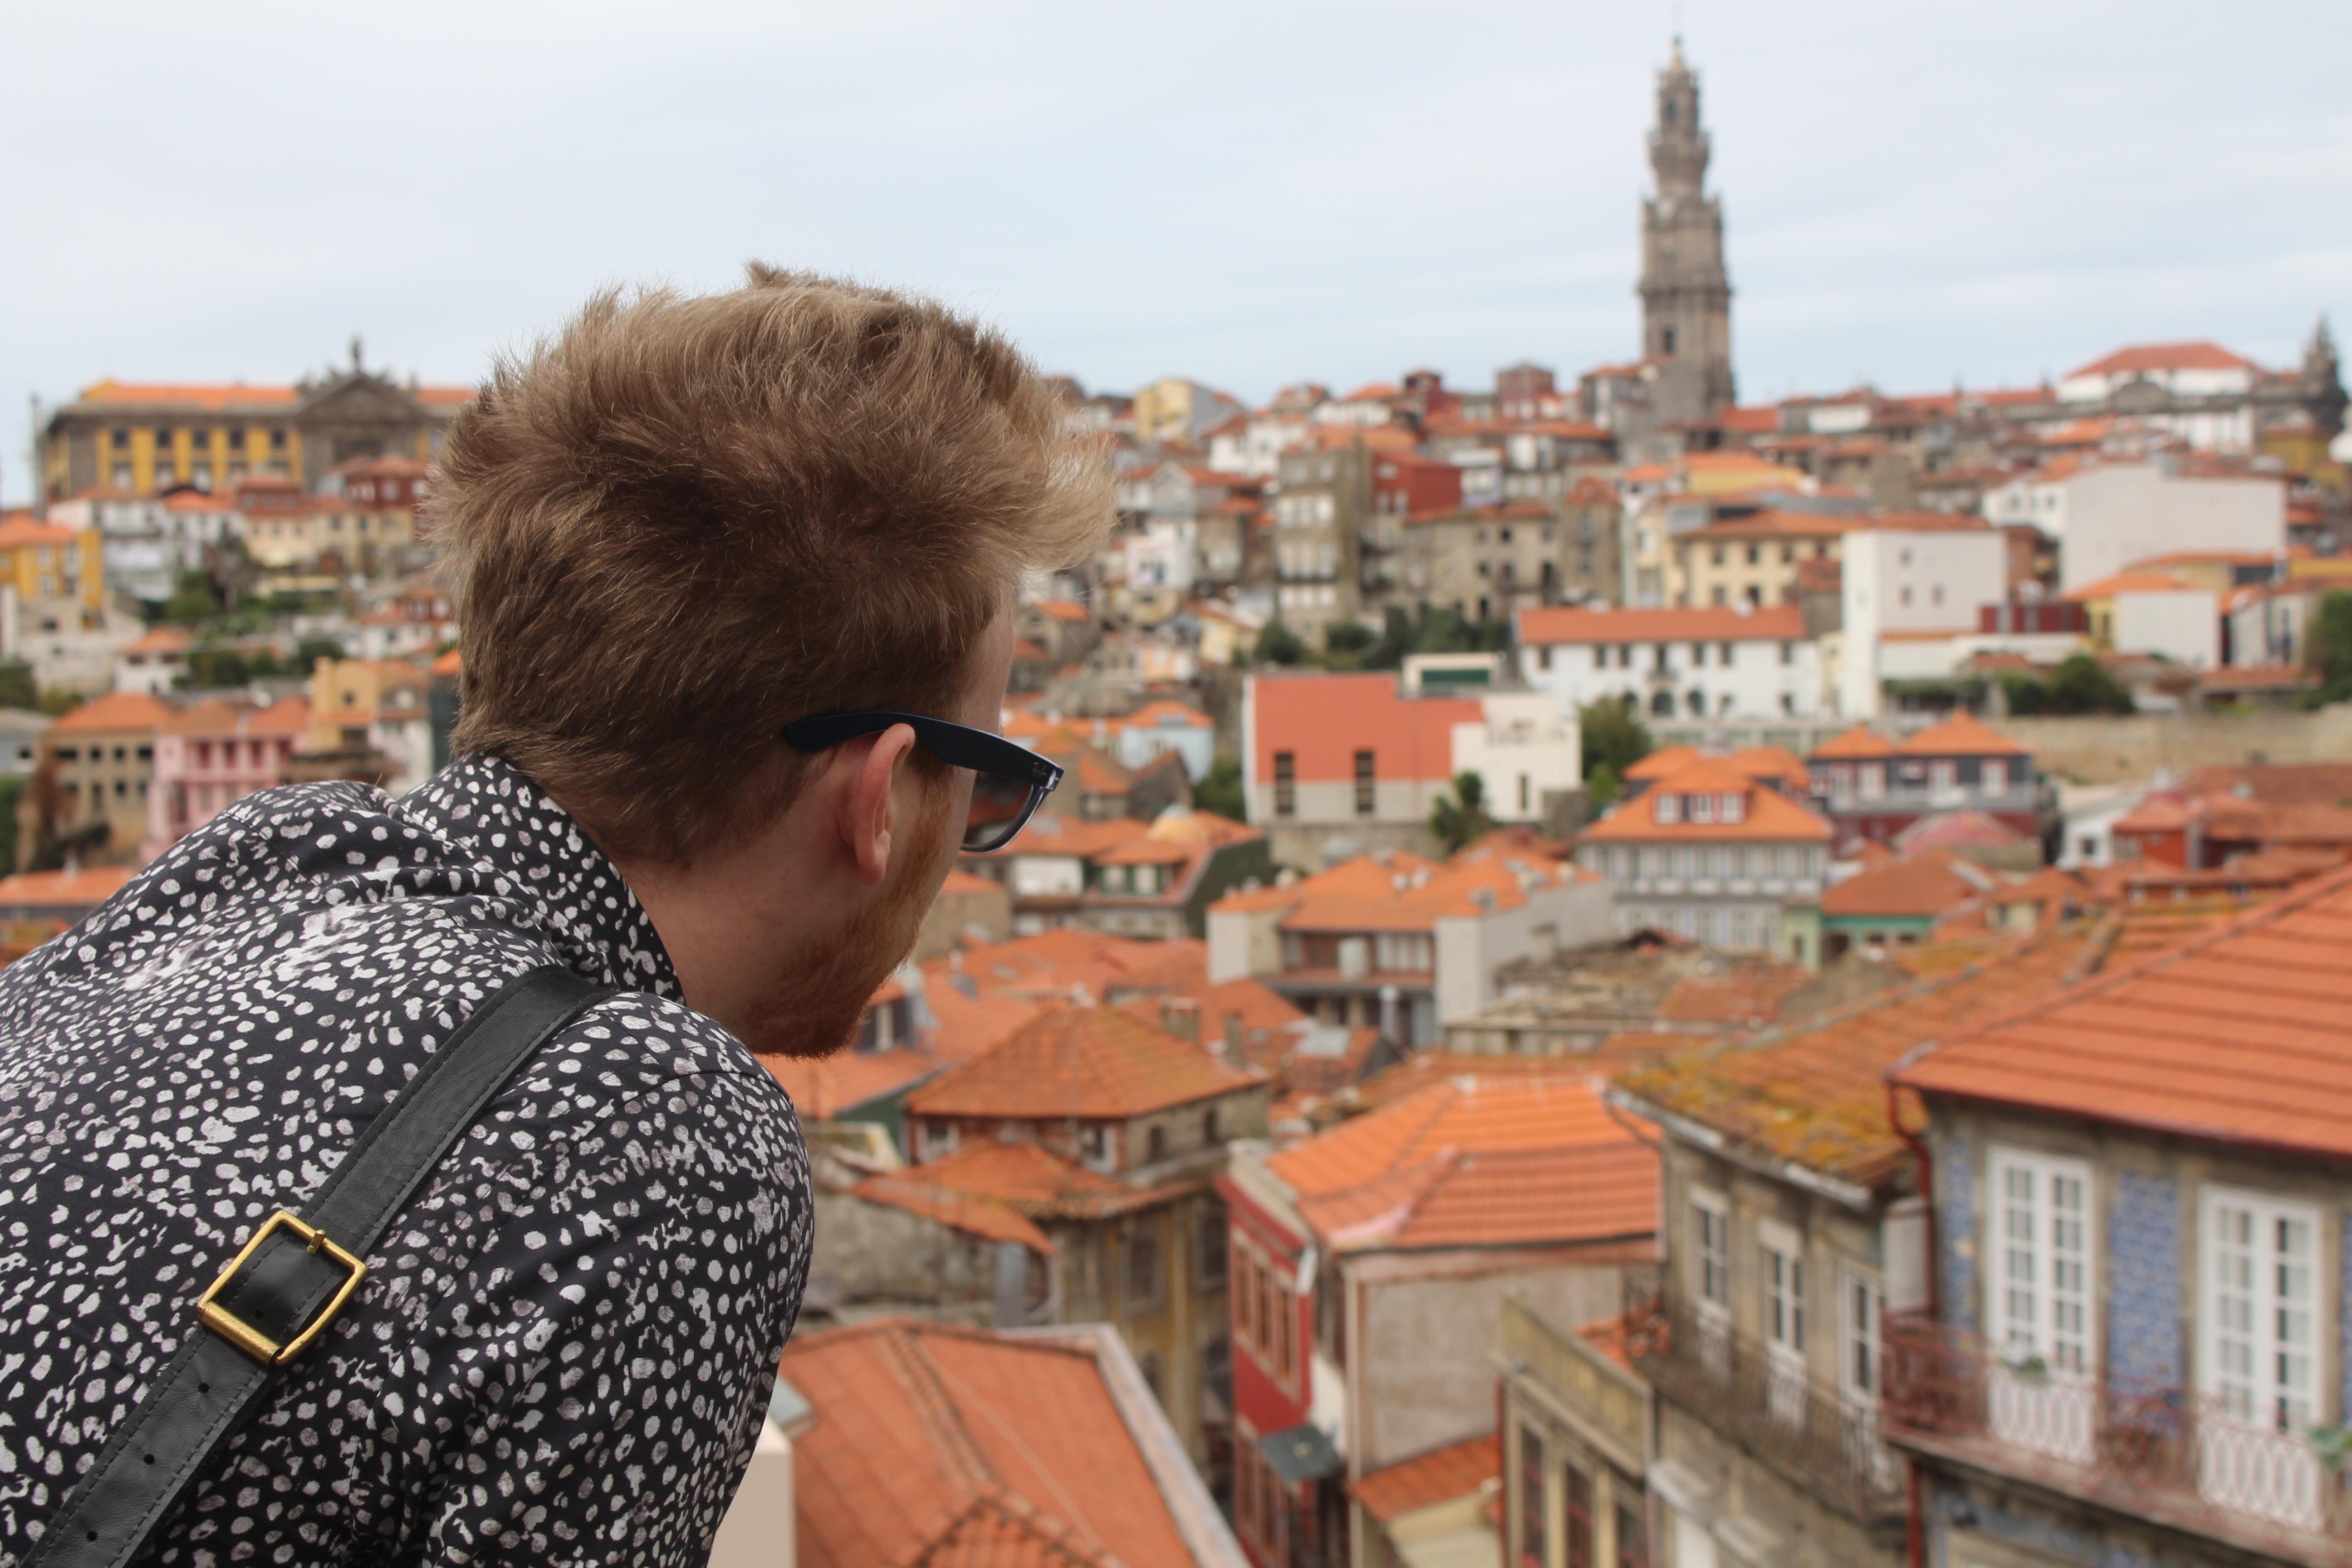 porto-portugal-weekend-photo-diary-002